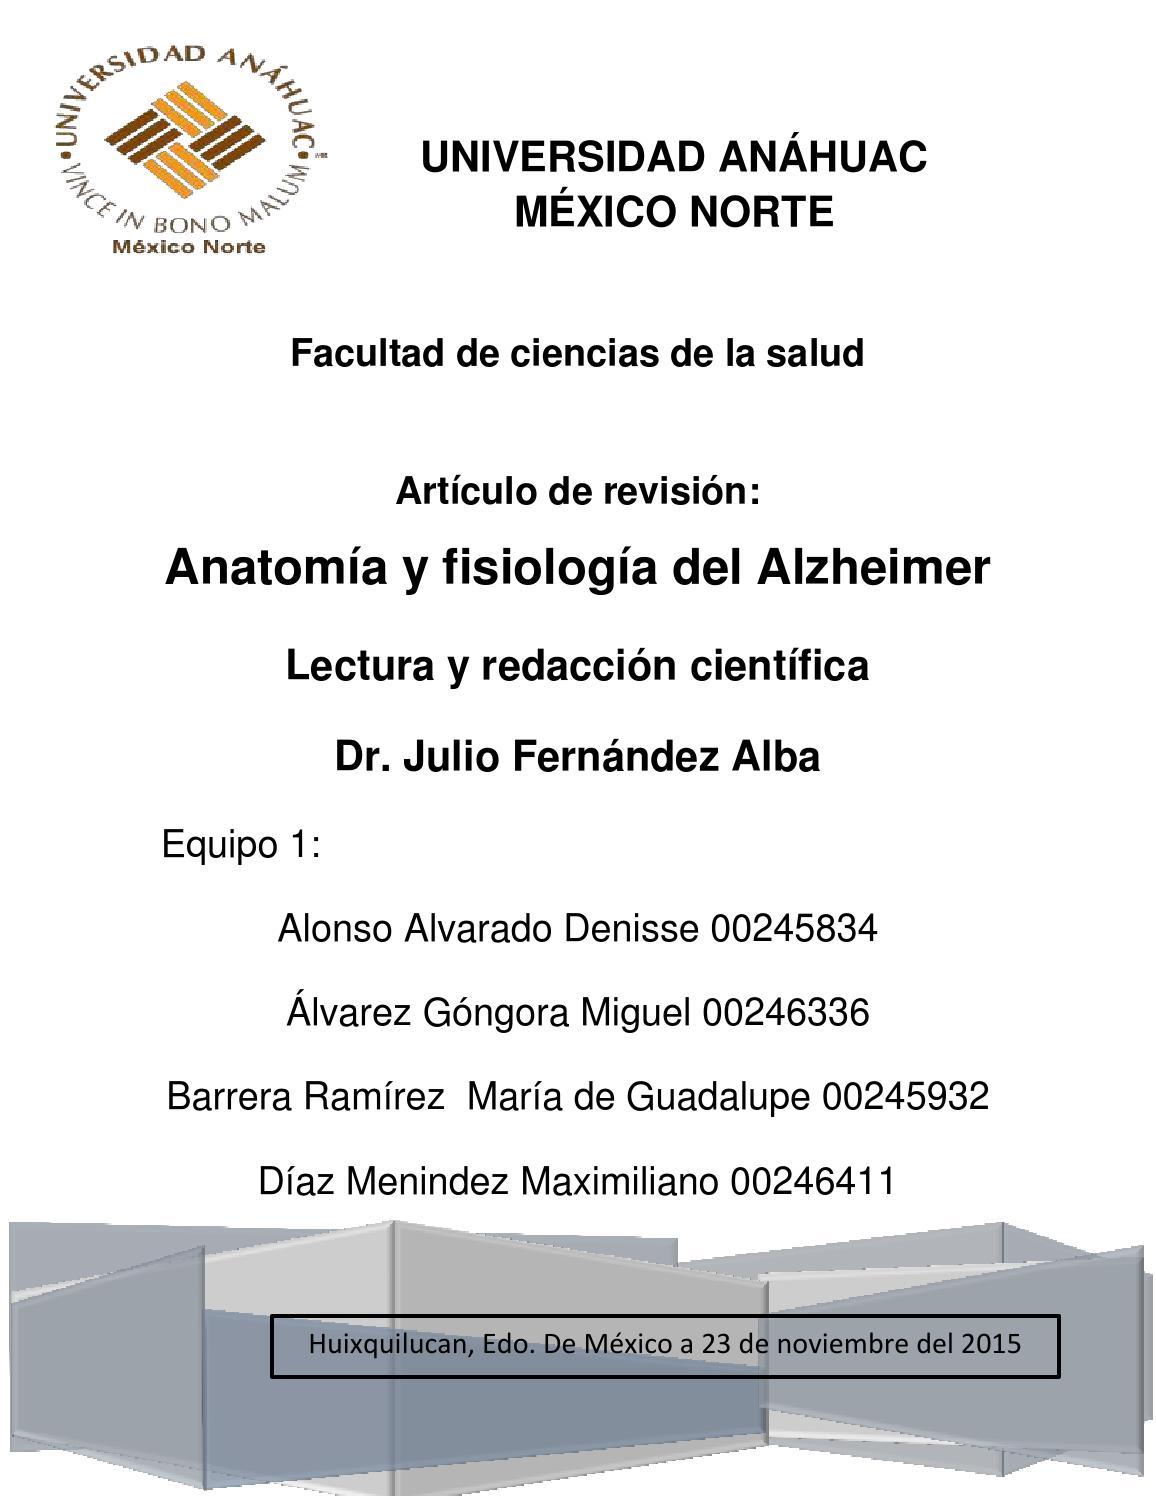 Equipo 1_Anatomía y fisiología del Alzheimer by Denisse Alonso - issuu